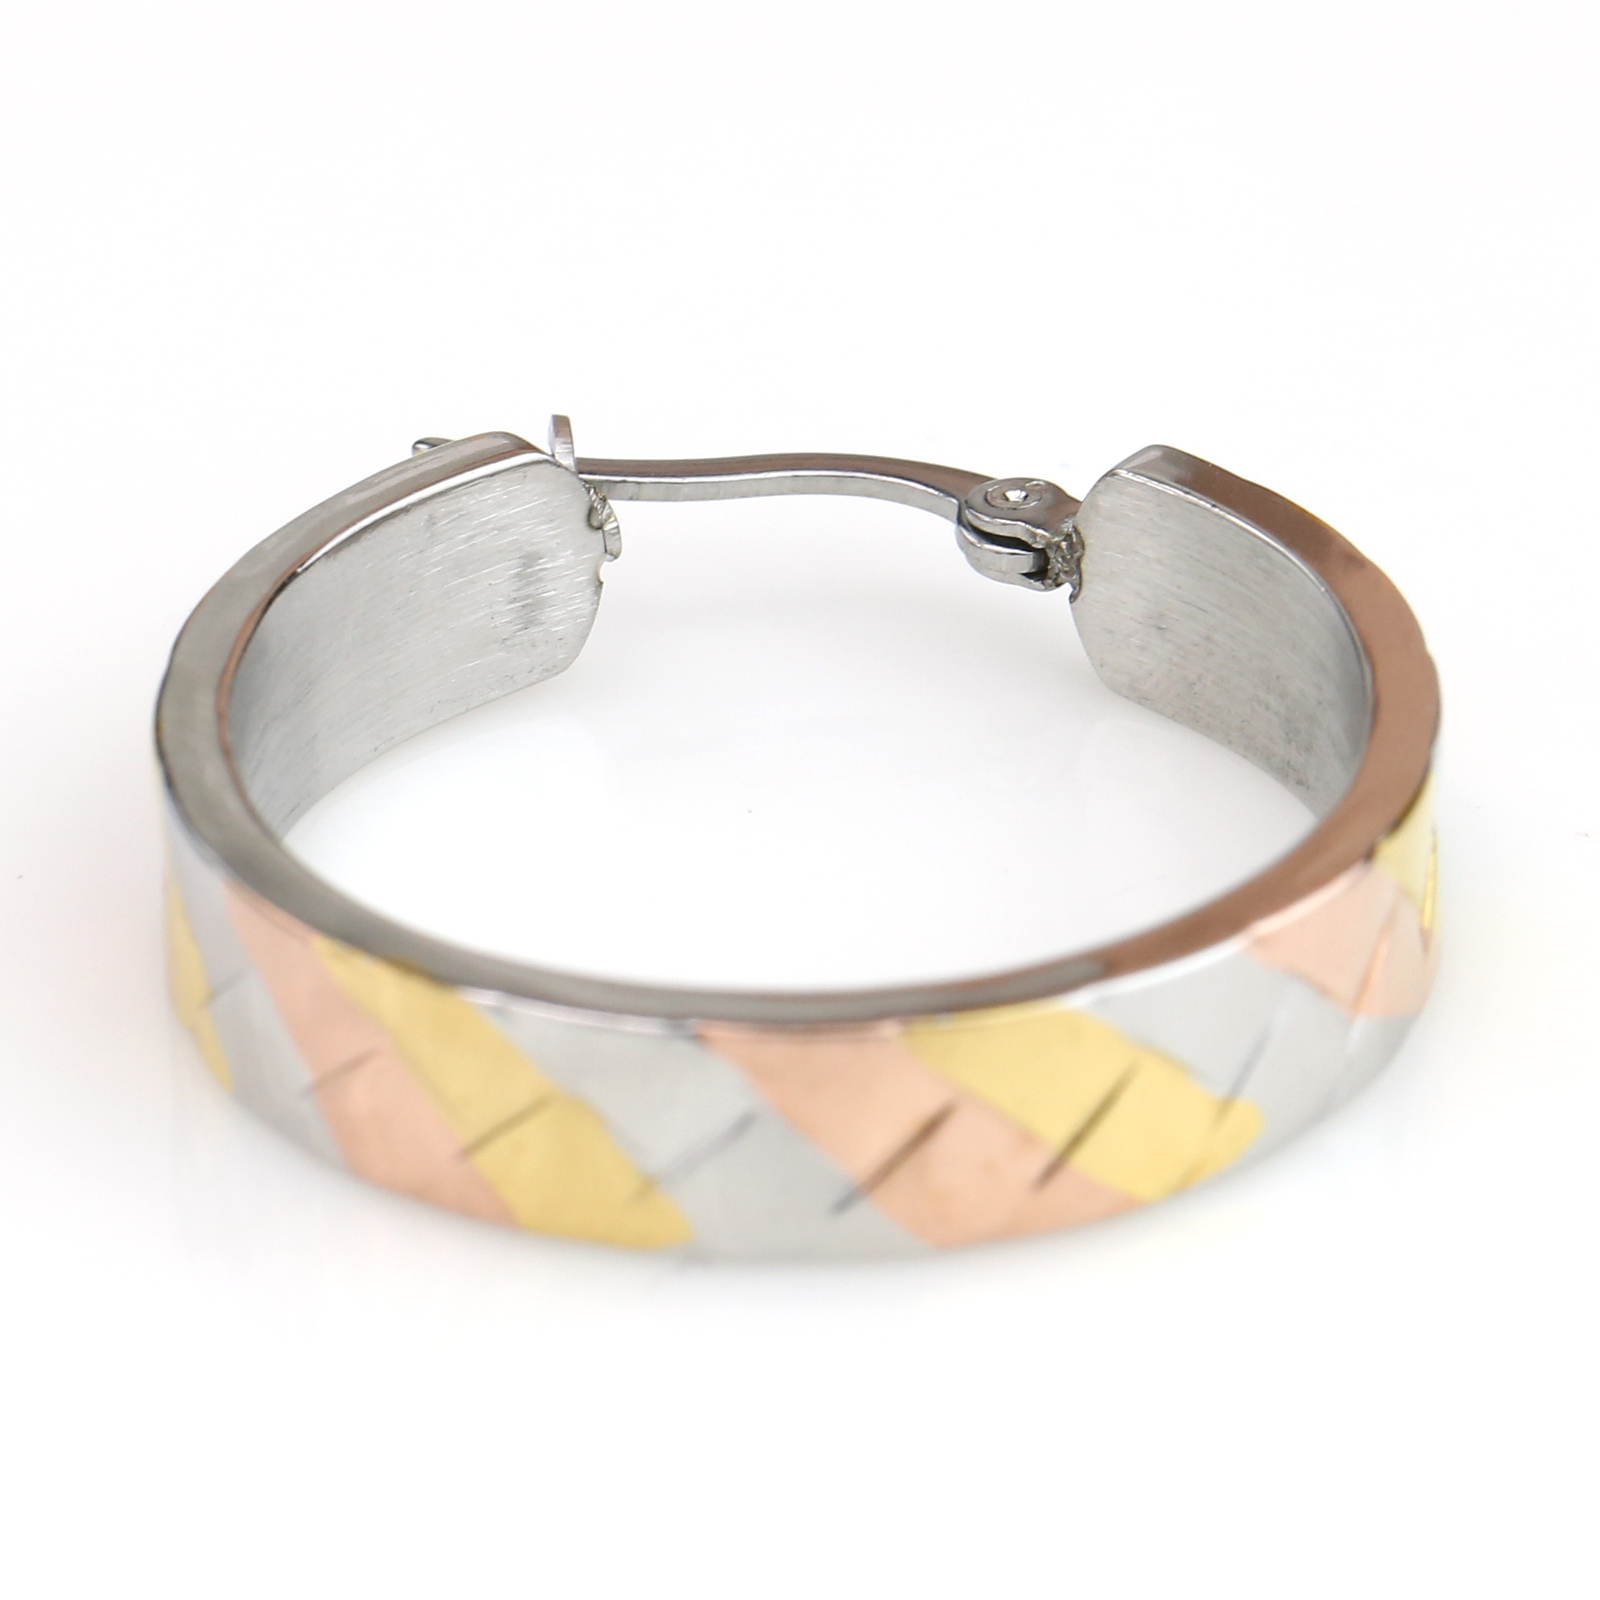 Retro Designed Tri-Color Silver, Gold & Rose Tone Hoop Earrings- United Elegance